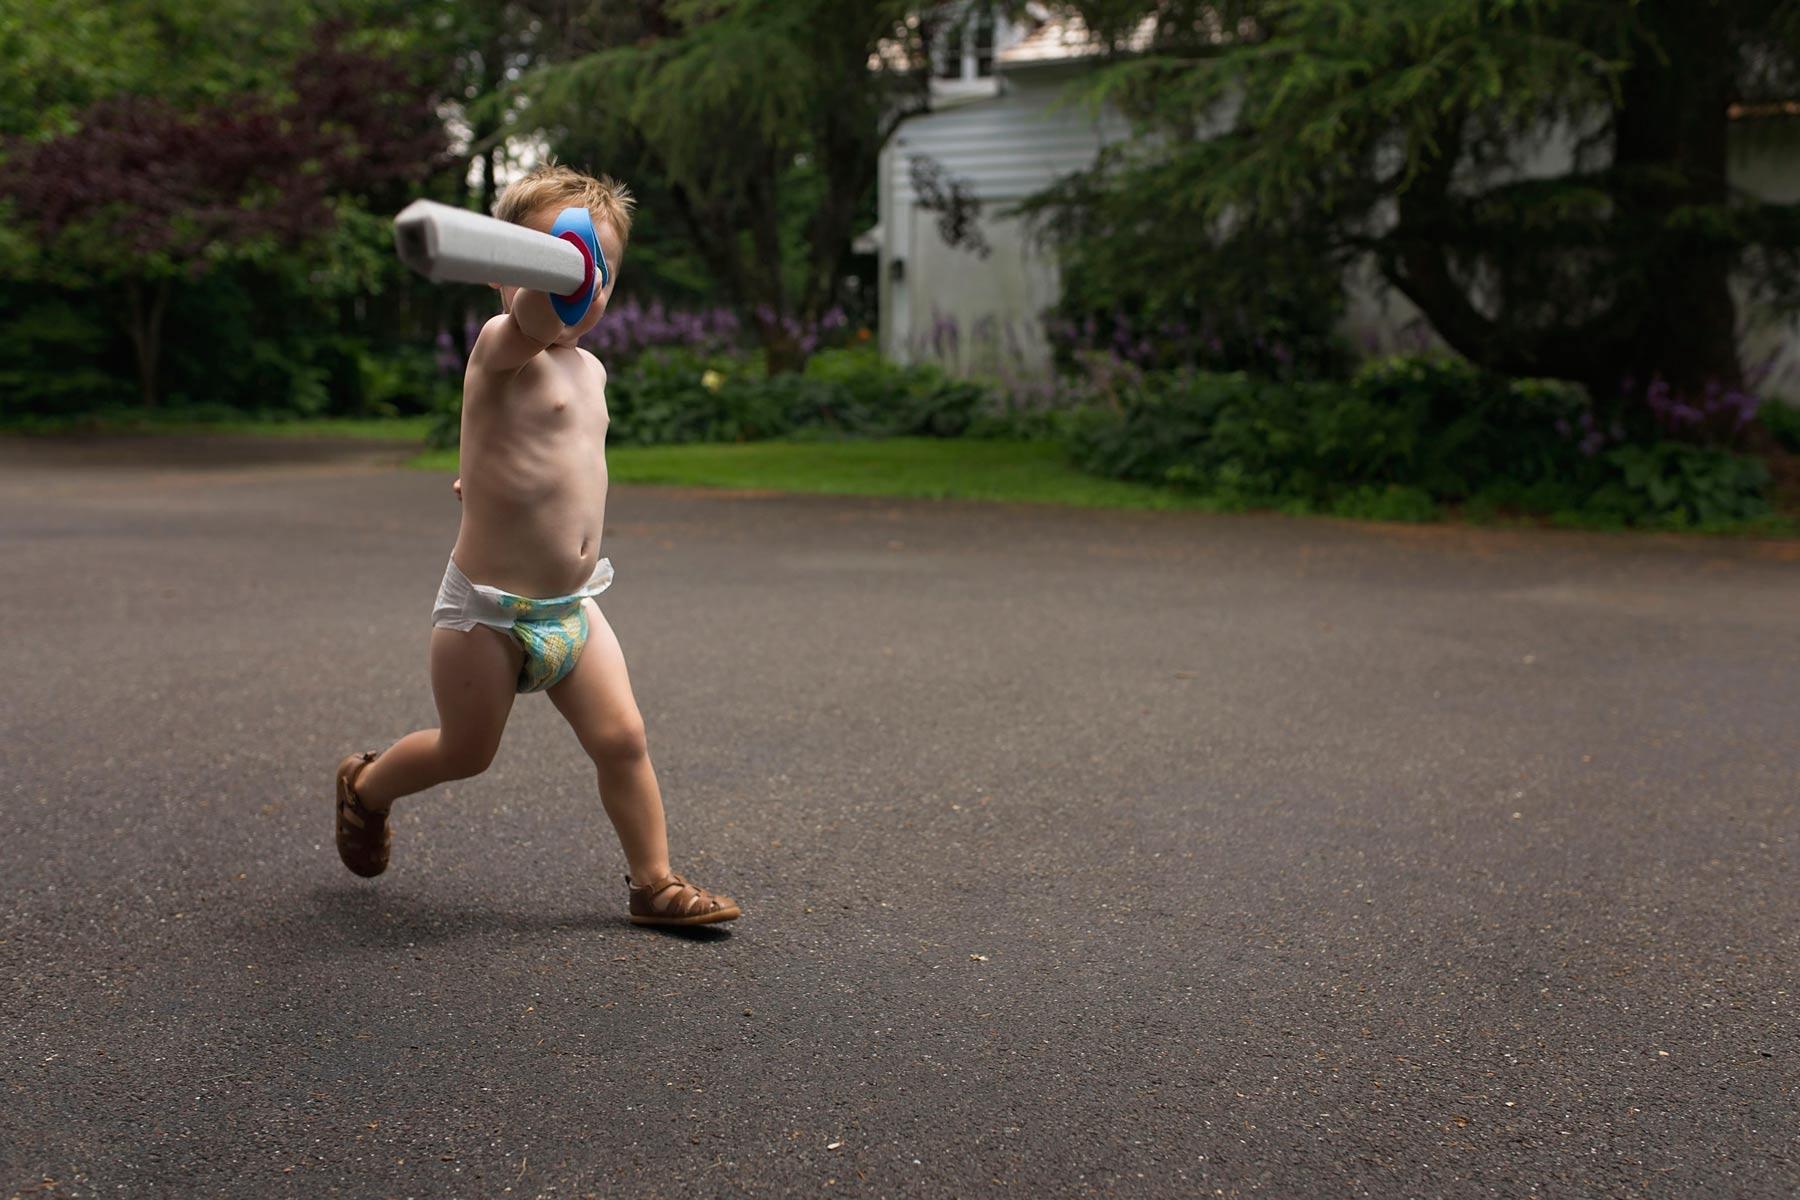 Little boy runs towards camera yielding a sword while wearing a diaper